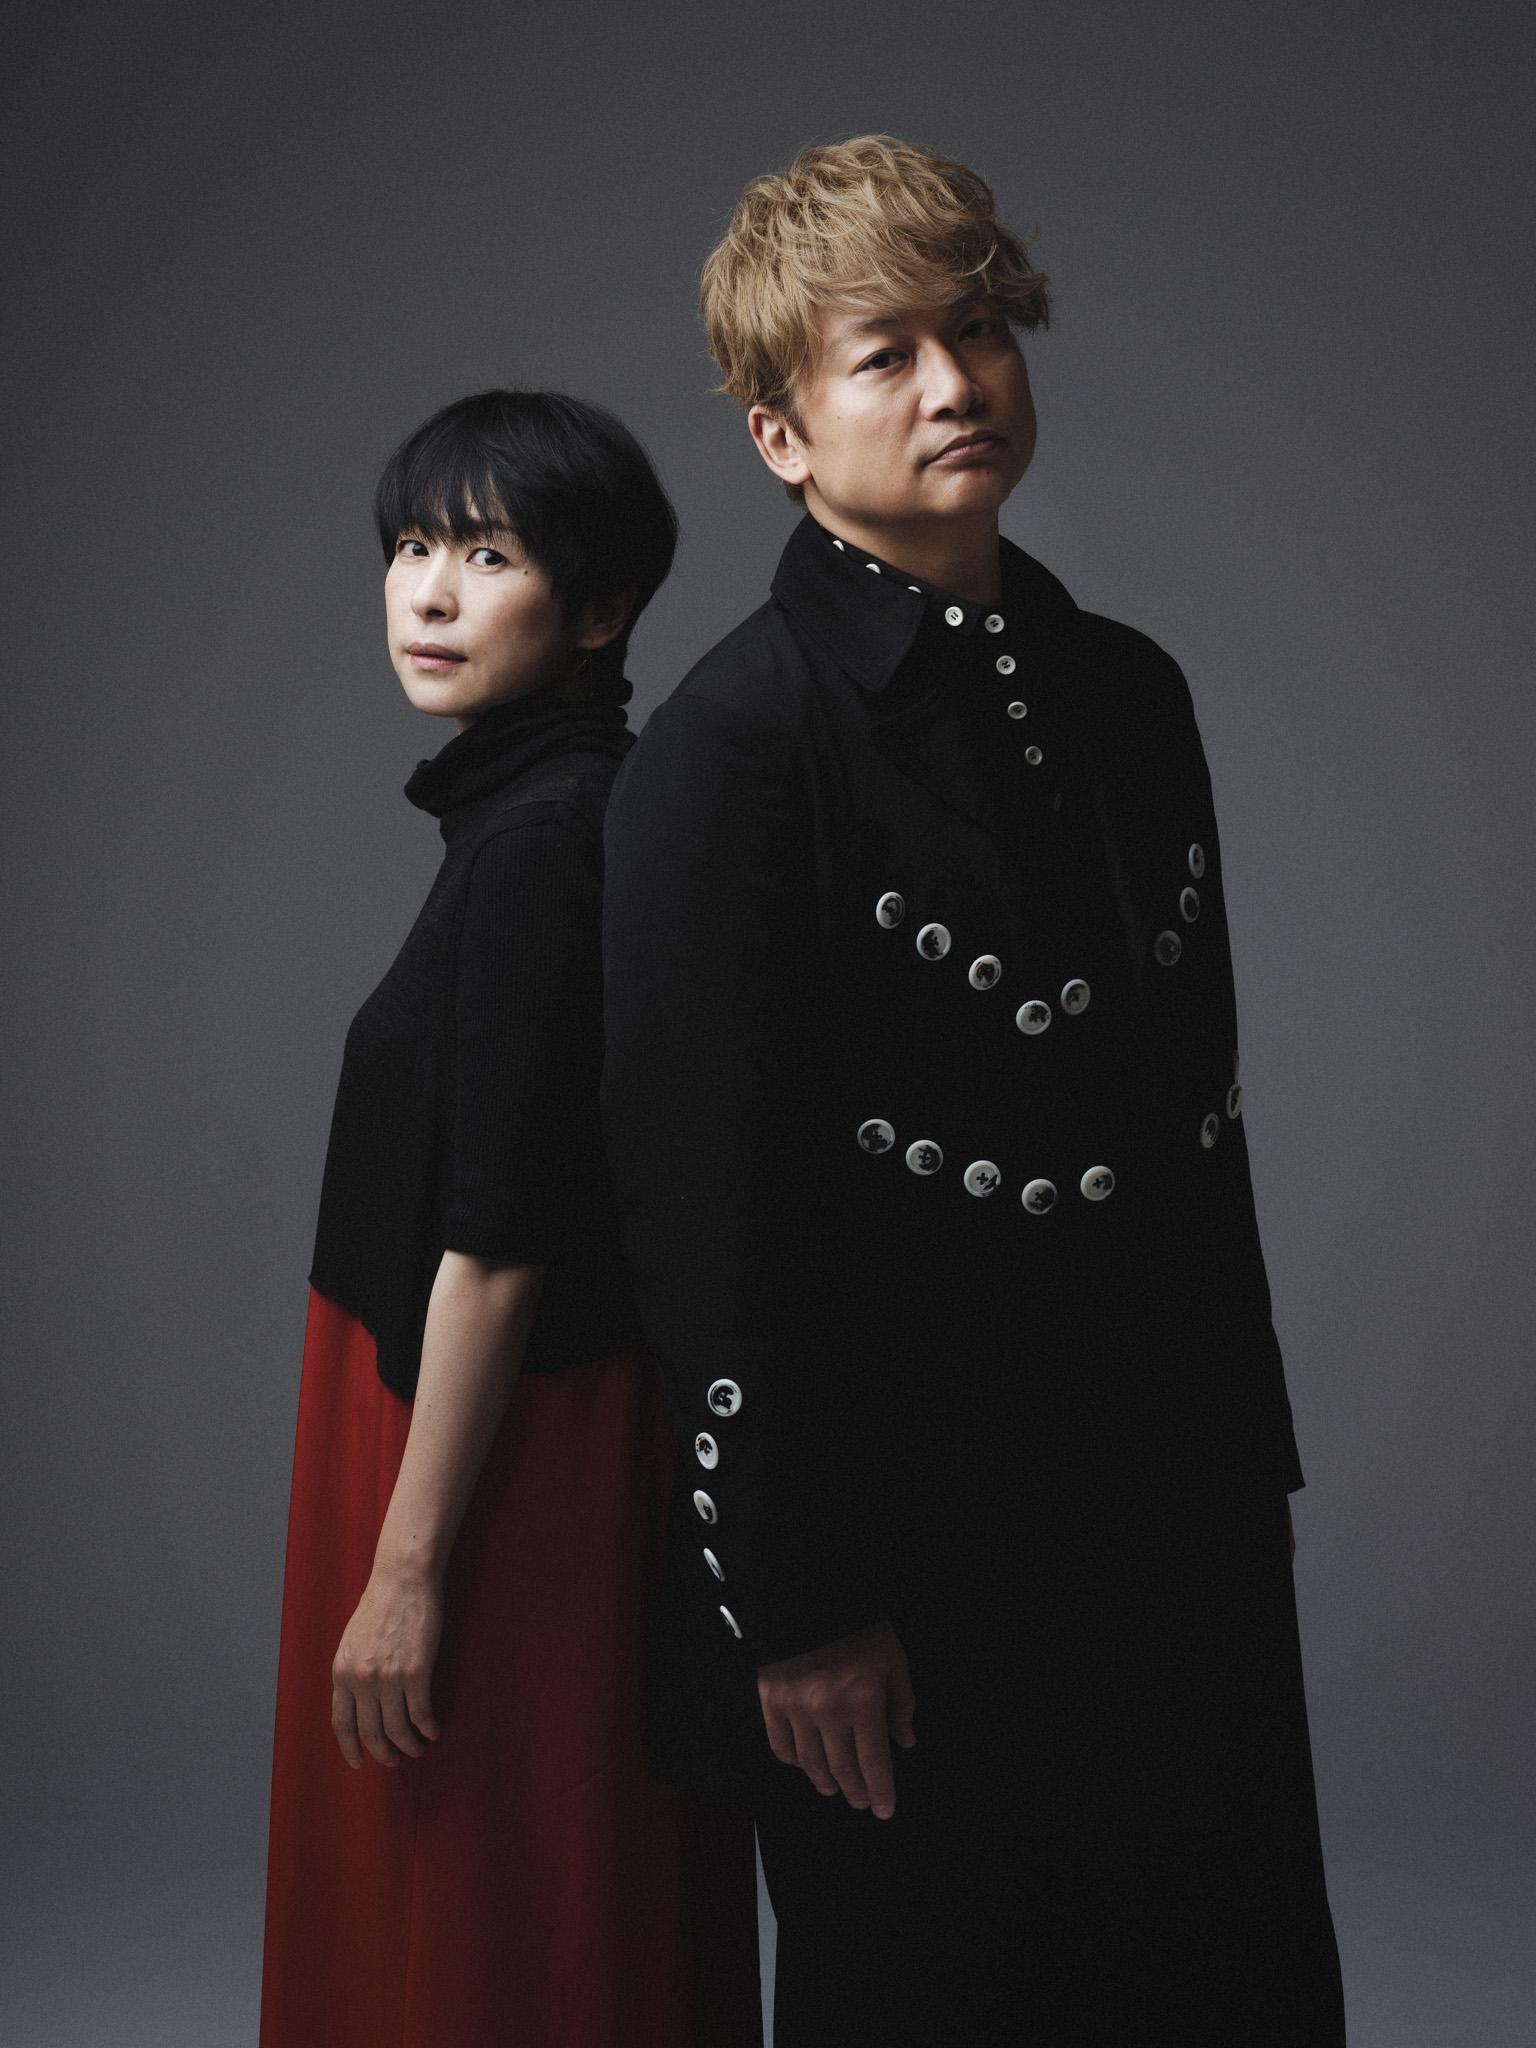 香取慎吾×西田尚美『凪待ち』